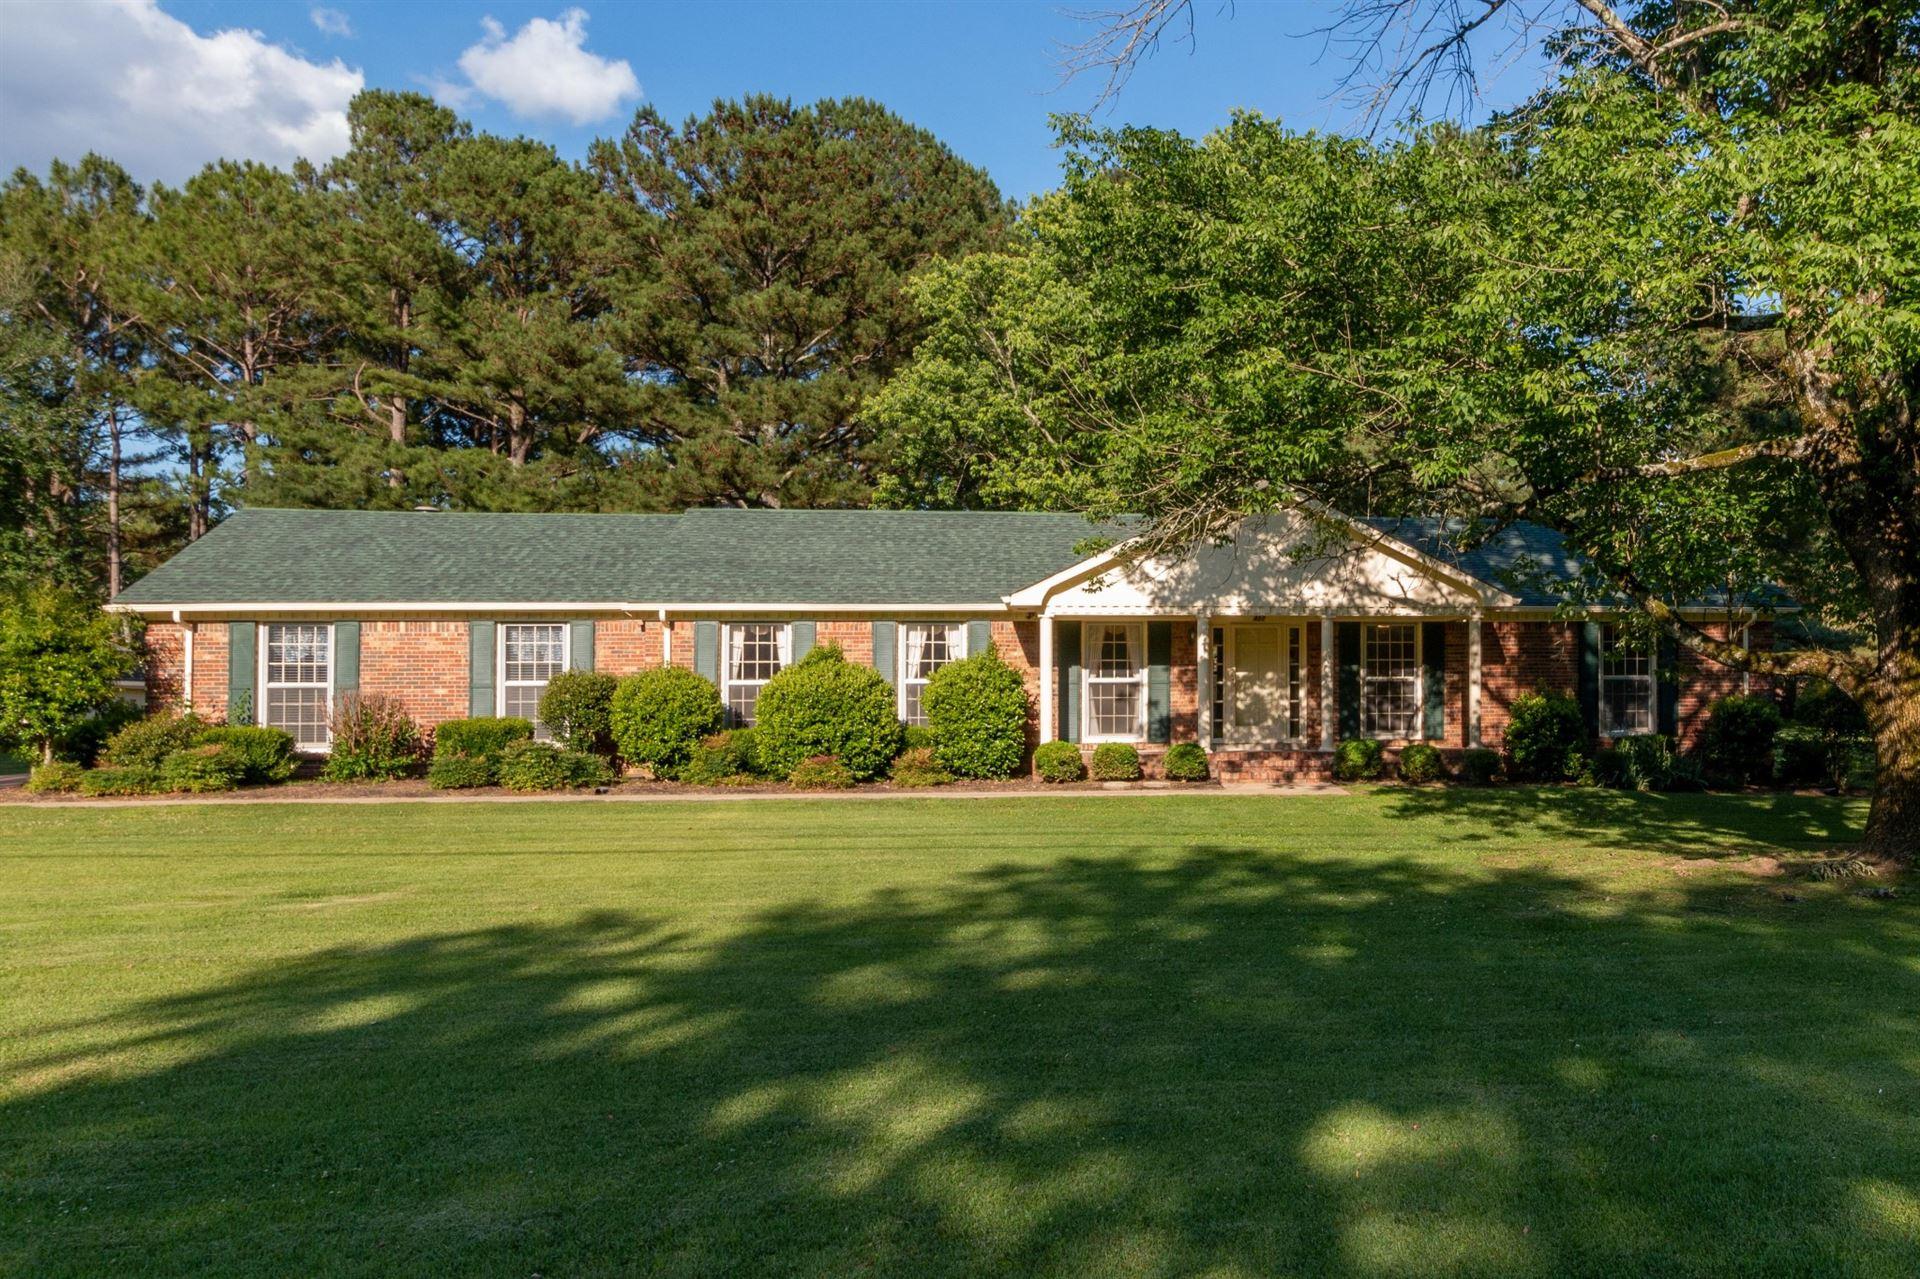 427 Manor Cir, Lewisburg, TN 37091 - MLS#: 2155733